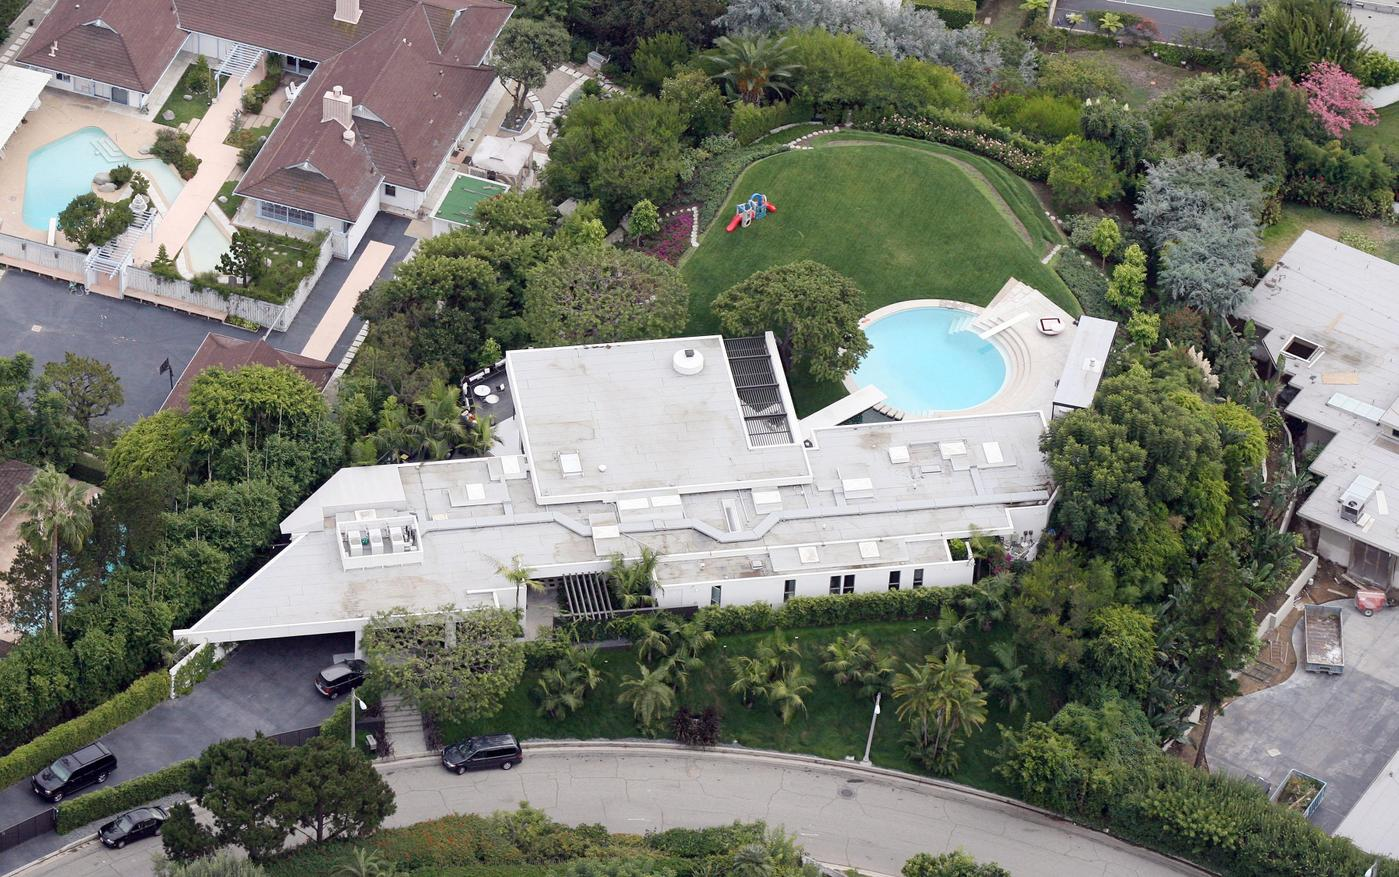 Дом Кортни Кокс и Дэвида Аркетта продается за ,5 млн